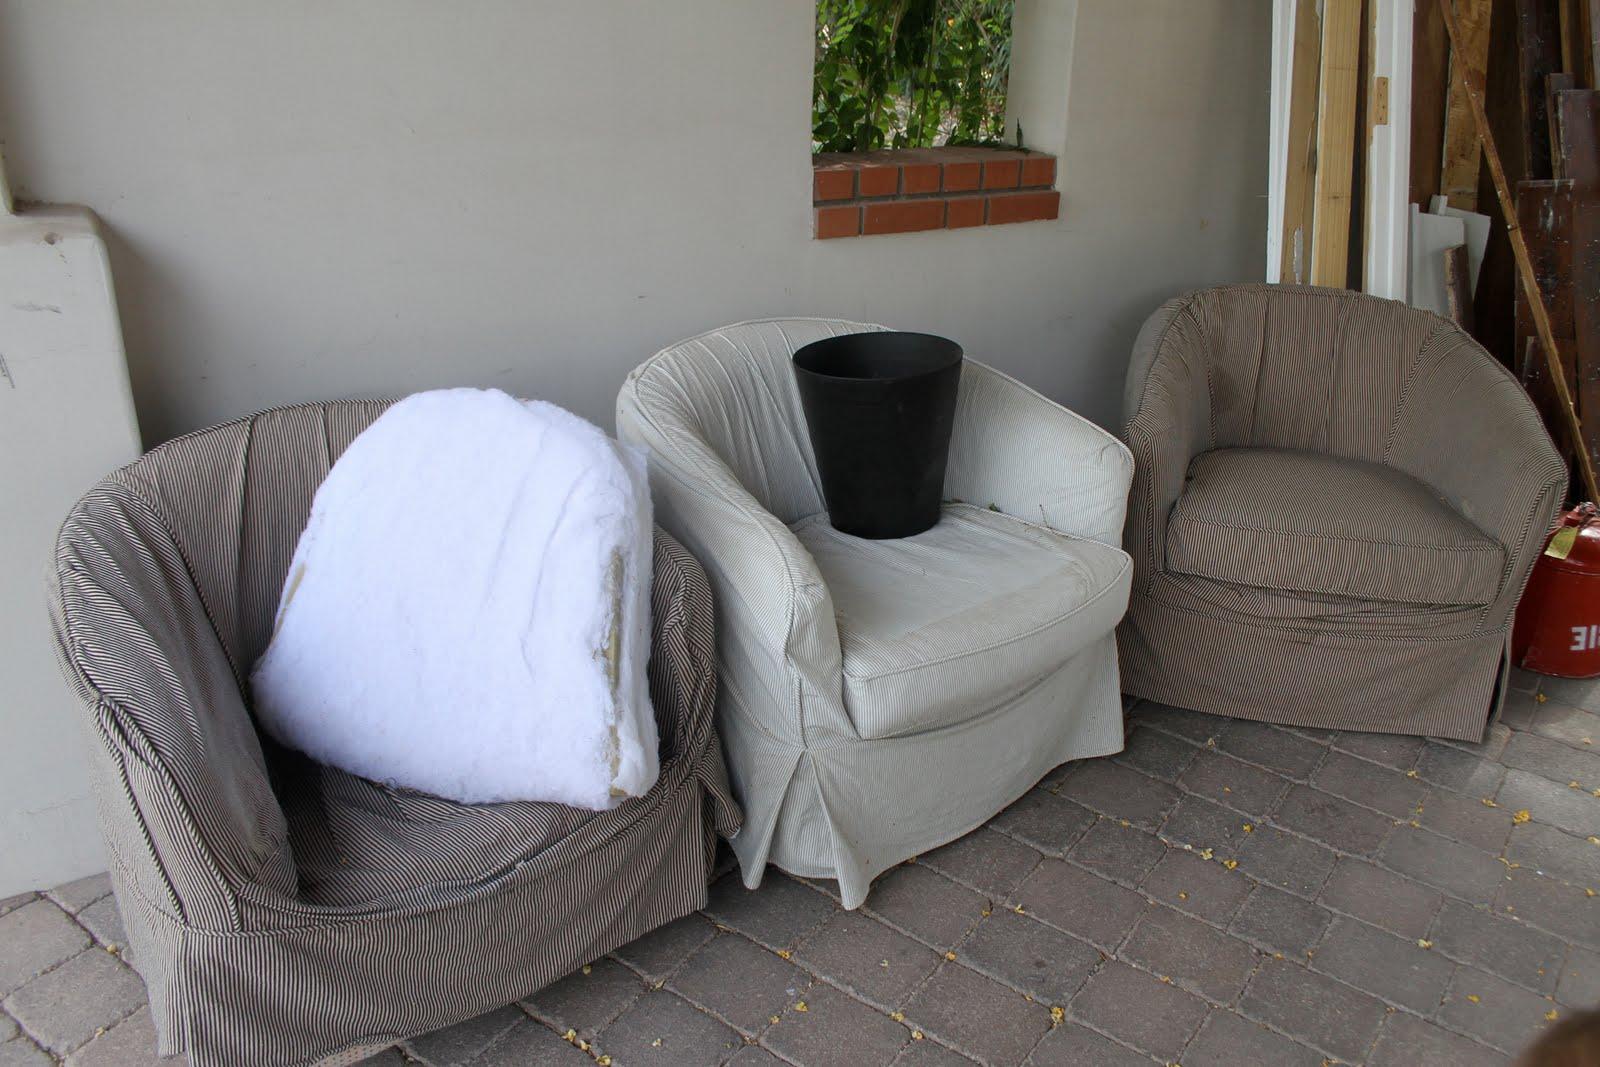 Barrel Chair Slipcover : barrel05 from inari-hof.de size 1600 x 1067 jpeg 229kB